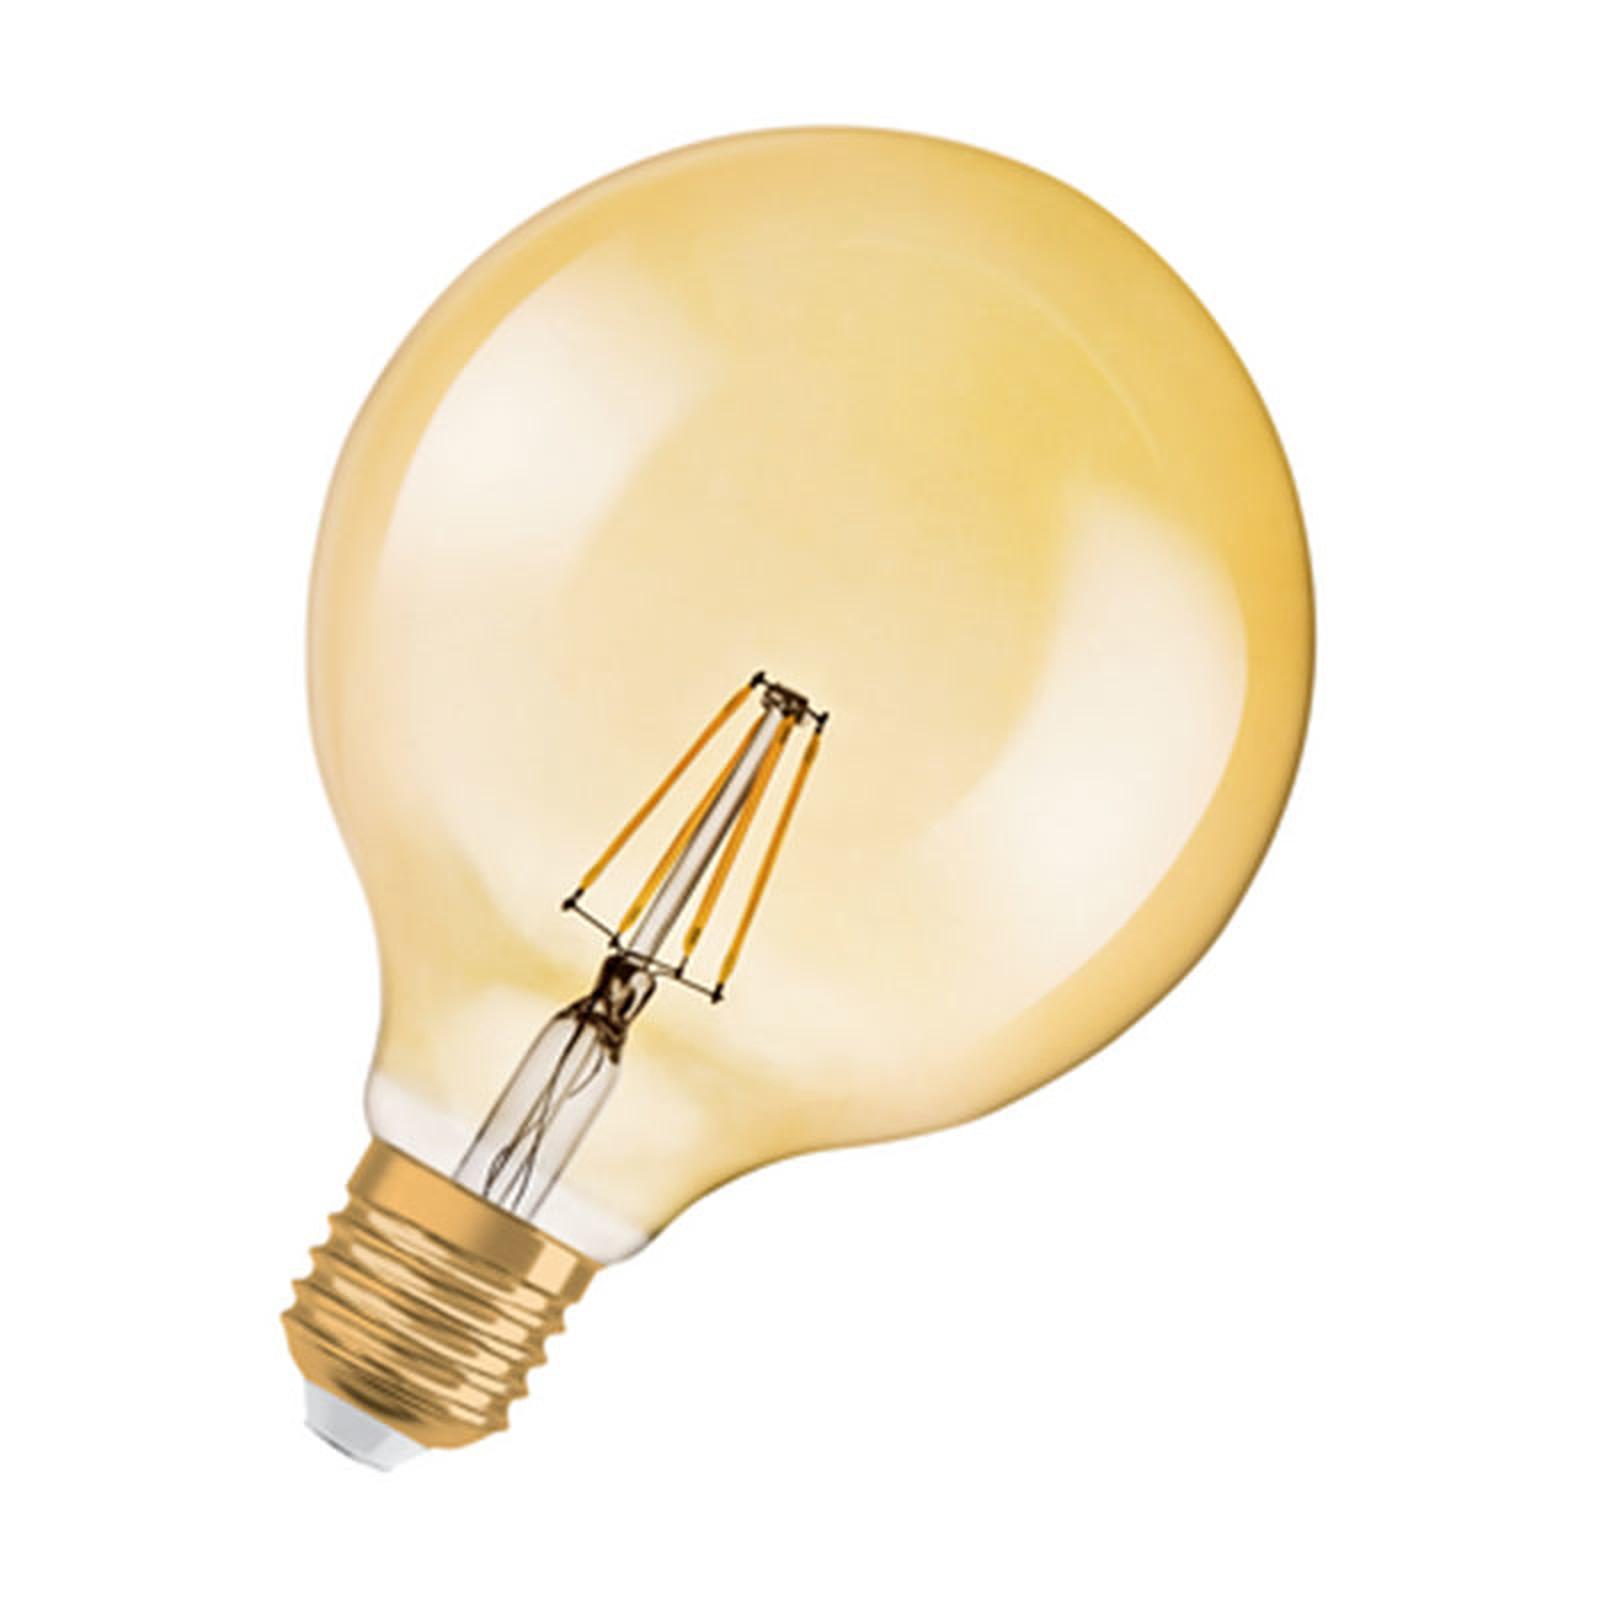 Osram Ampoule Led Retrofit Standard E27 4w 40w A: OSRAM Ampoule LED Globe Vintage E27 4W (35W) A++